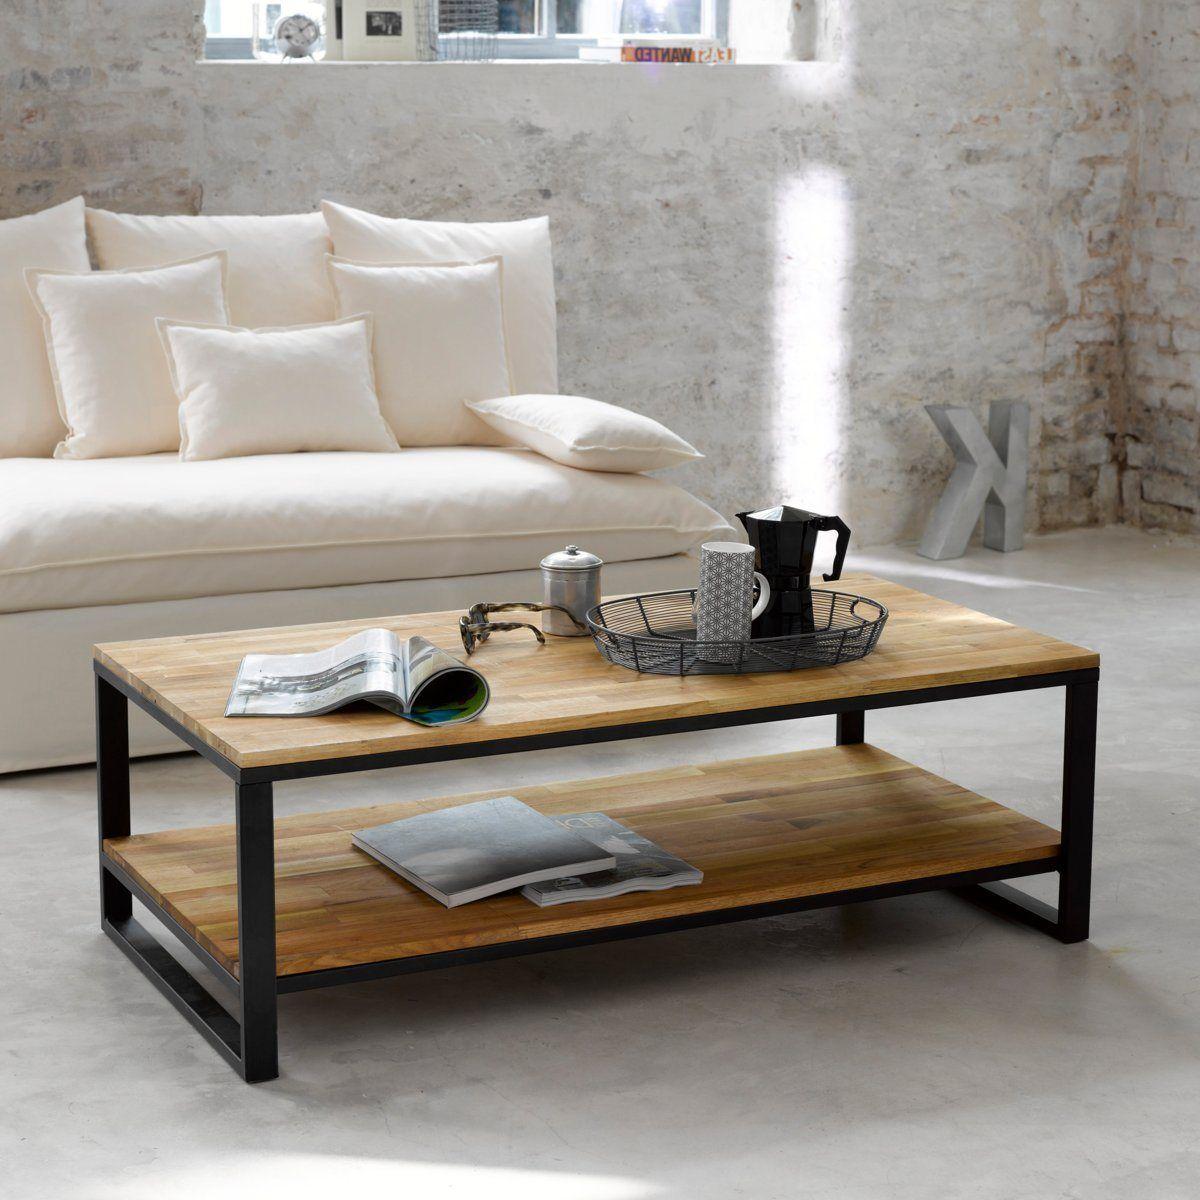 Table Basse Double Plateau En Noyer Massif Aboute Et Acier Hiba Table Basse Chene Table Basse Salon Table Basse